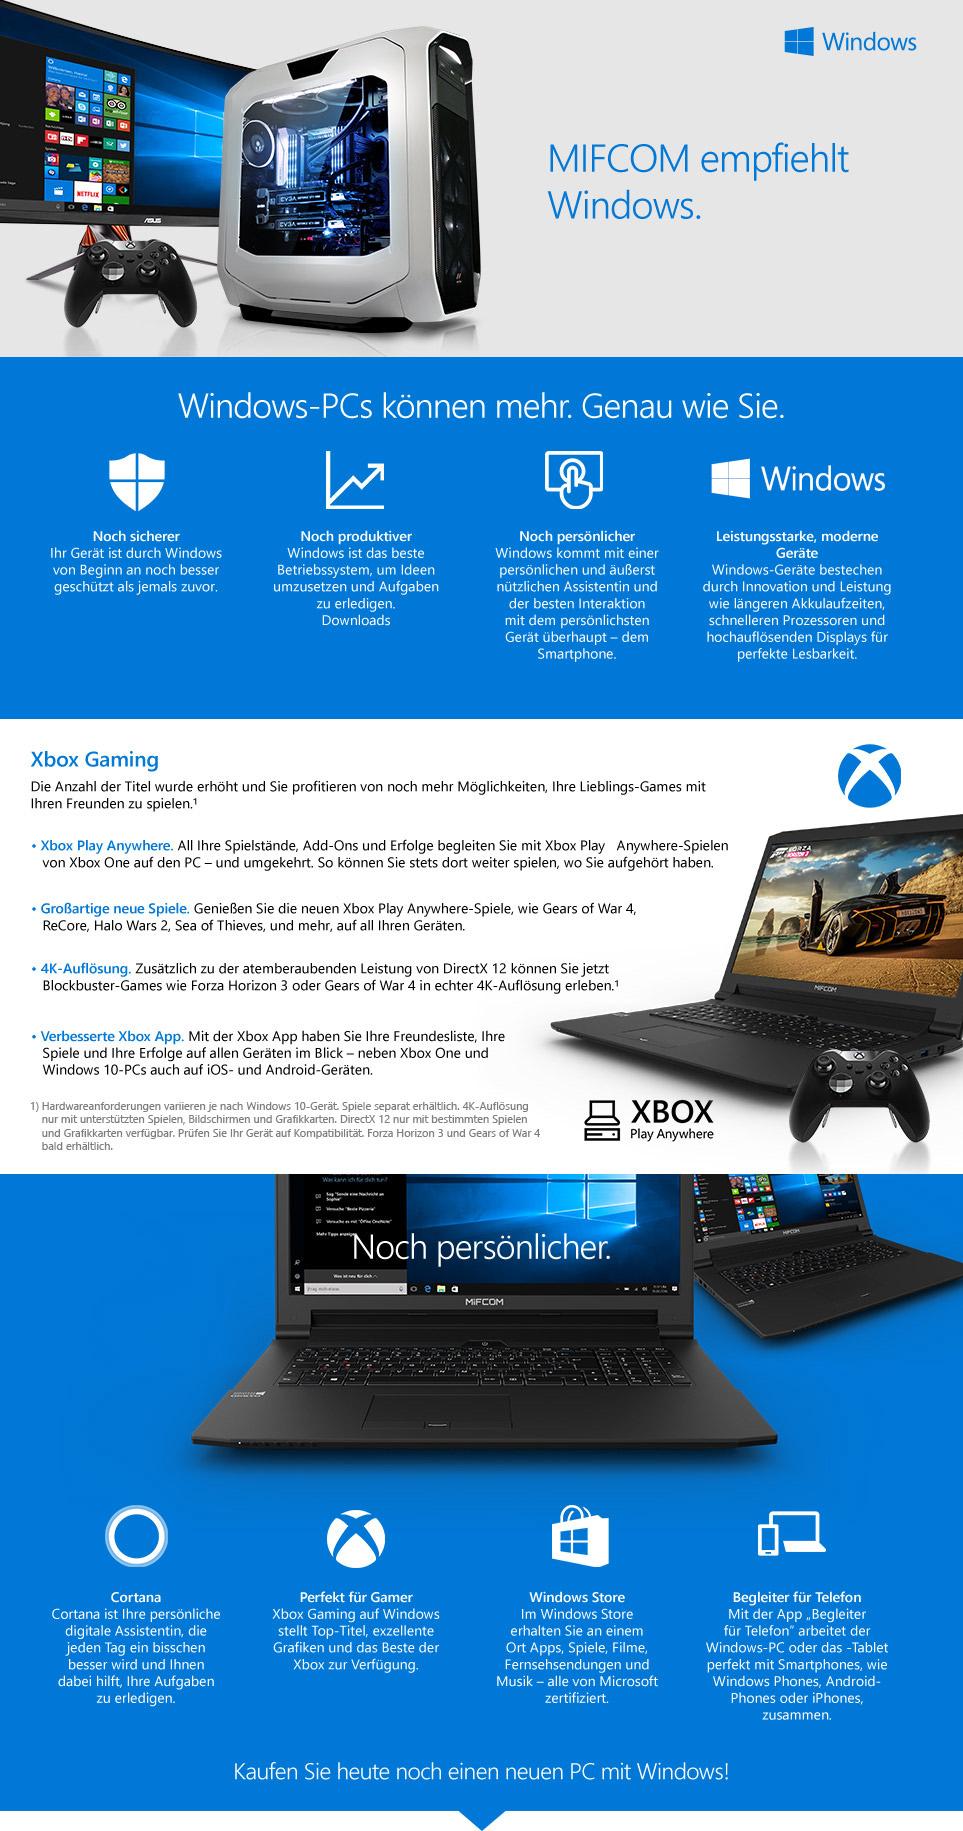 MIFCOM empfiehlt Windows